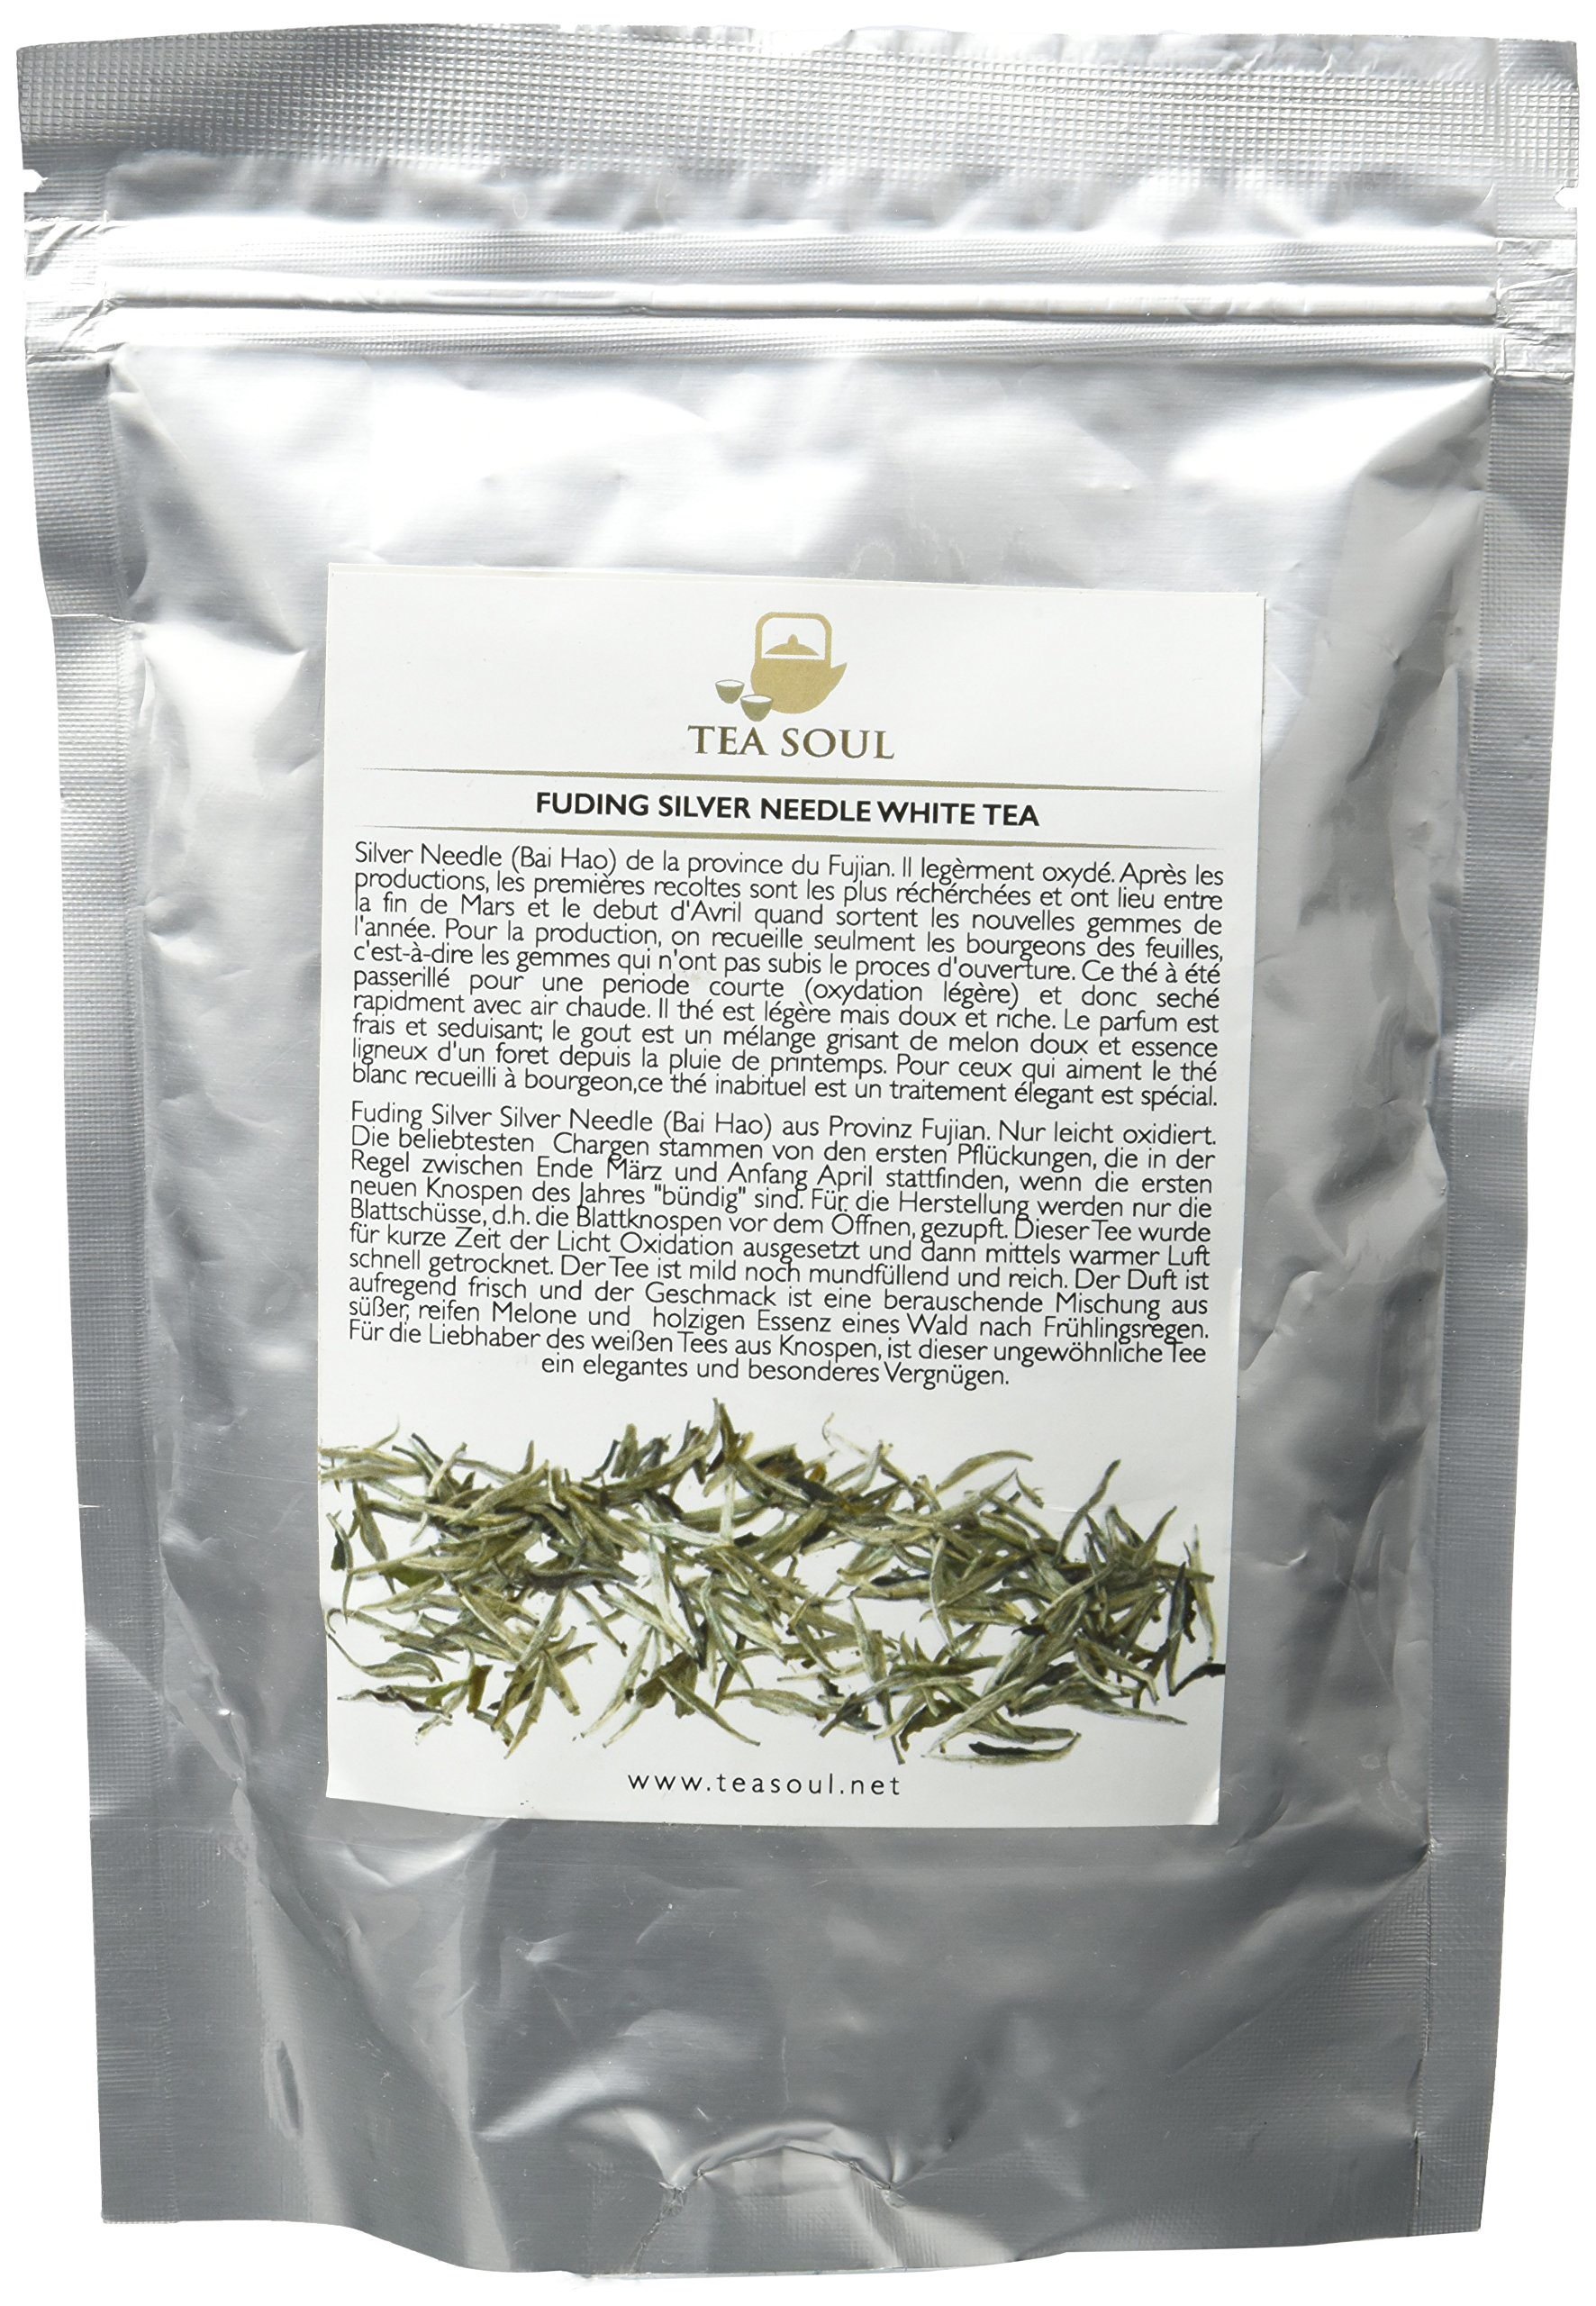 Tea-Soul-Silver-Needle-Bai-Hao-Premium-Lose-Blatt-Weier-Tee-aus-Fuding-und-aus-der-Provinz-Fujian-1er-Pack-1-x-50-g